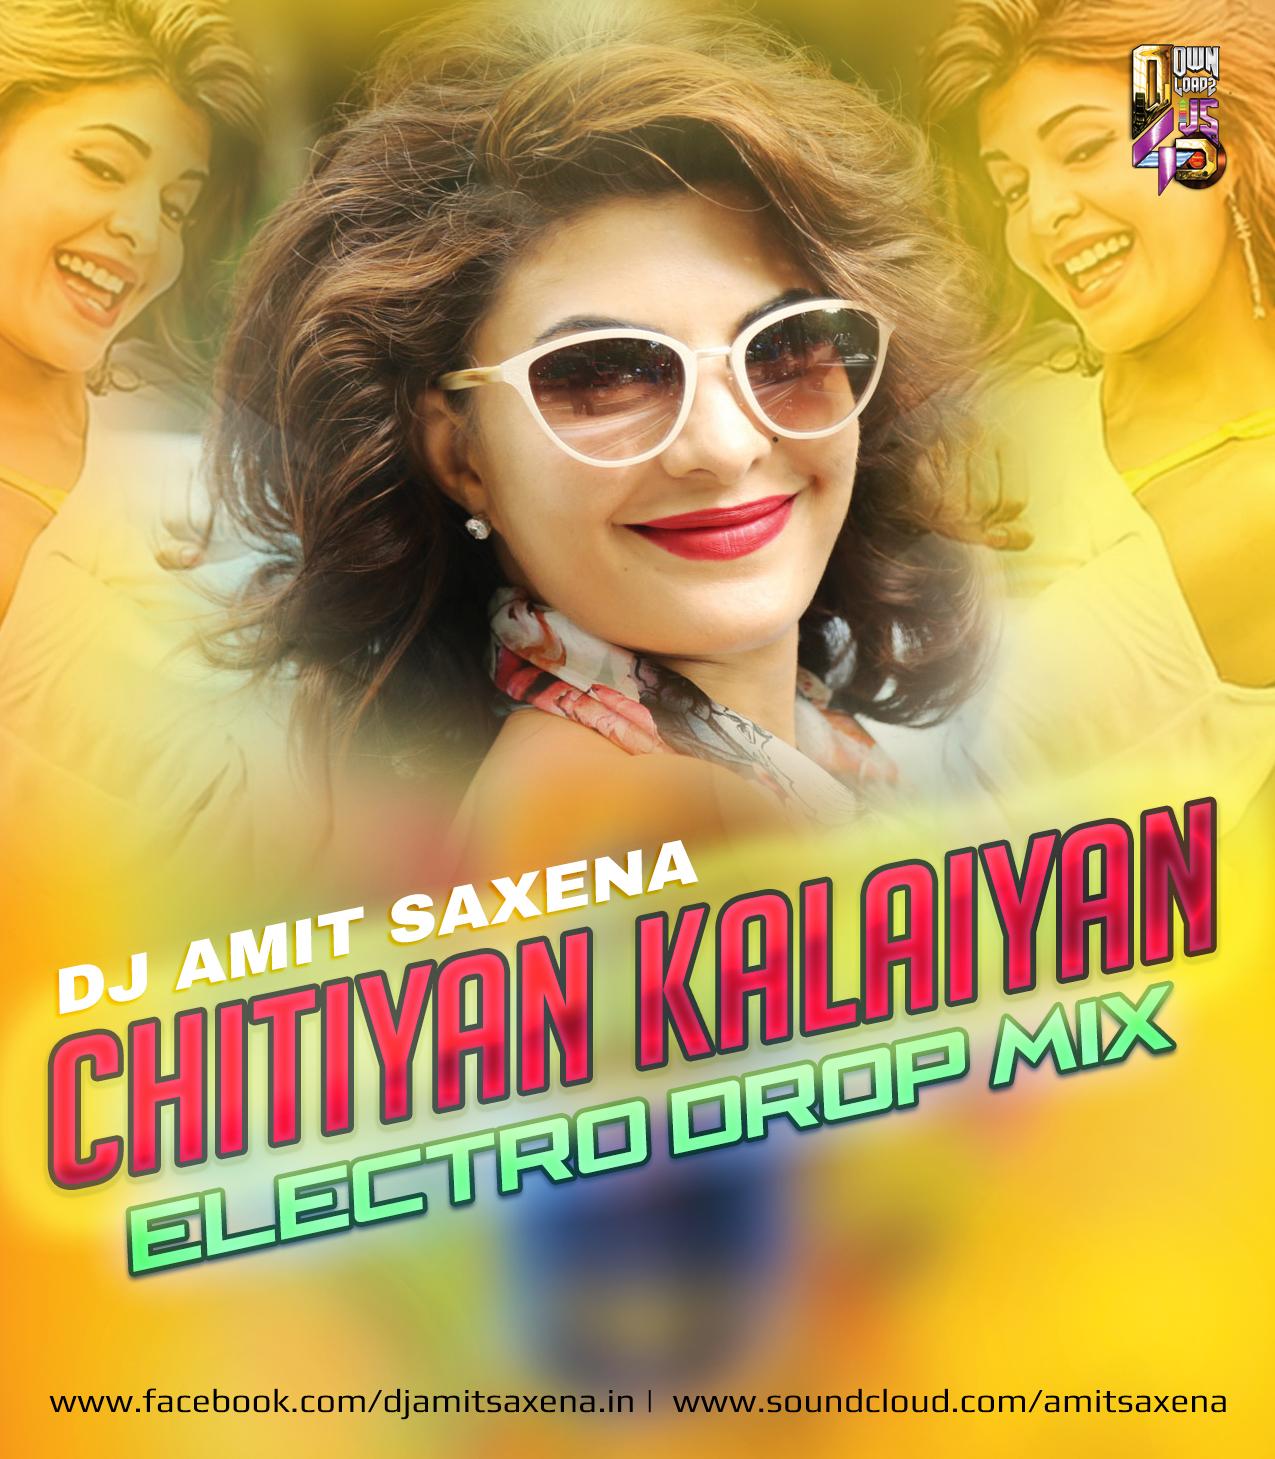 Dj Amit Saxena   Downloads4Djs - India's No#1 Online DJ Portal